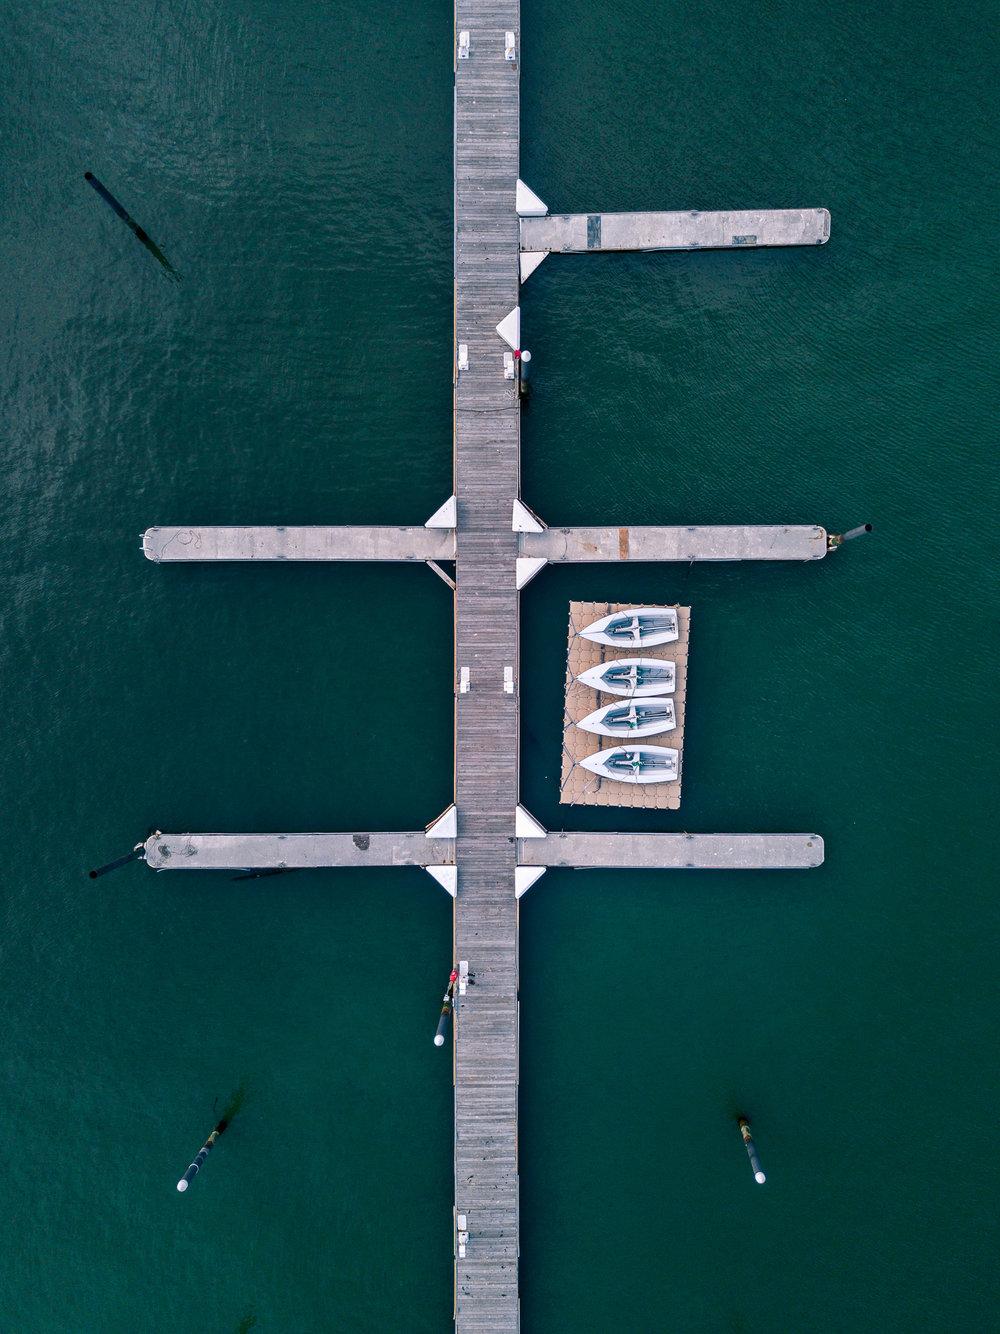 jerseycitydock_typoland_aerial-1.jpg